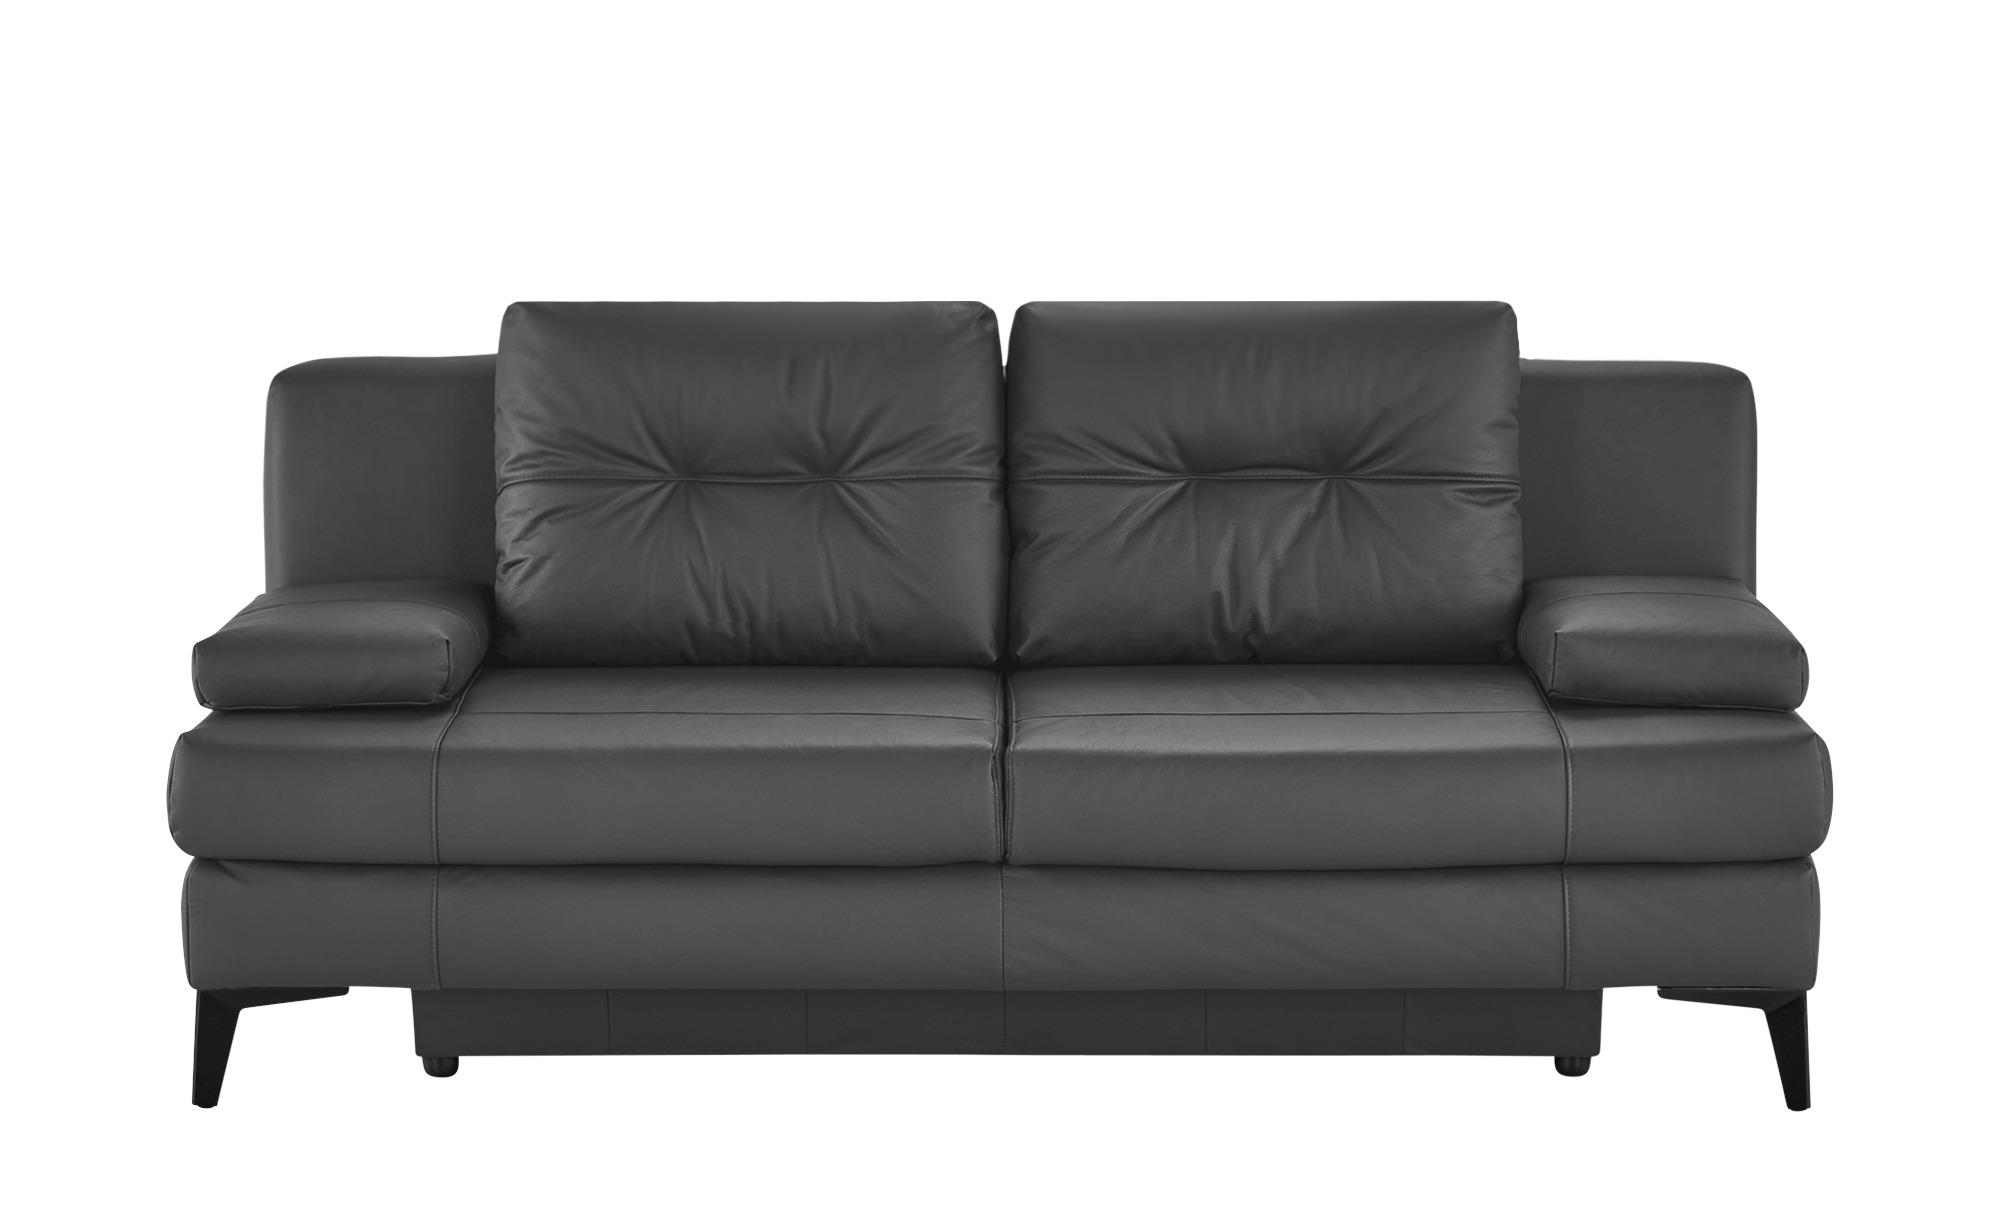 Ledersofa  Svea ¦ grau ¦ Maße (cm): B: 202 H: 92 T: 100 Polstermöbel > Sofas > 2-Sitzer - Höffner